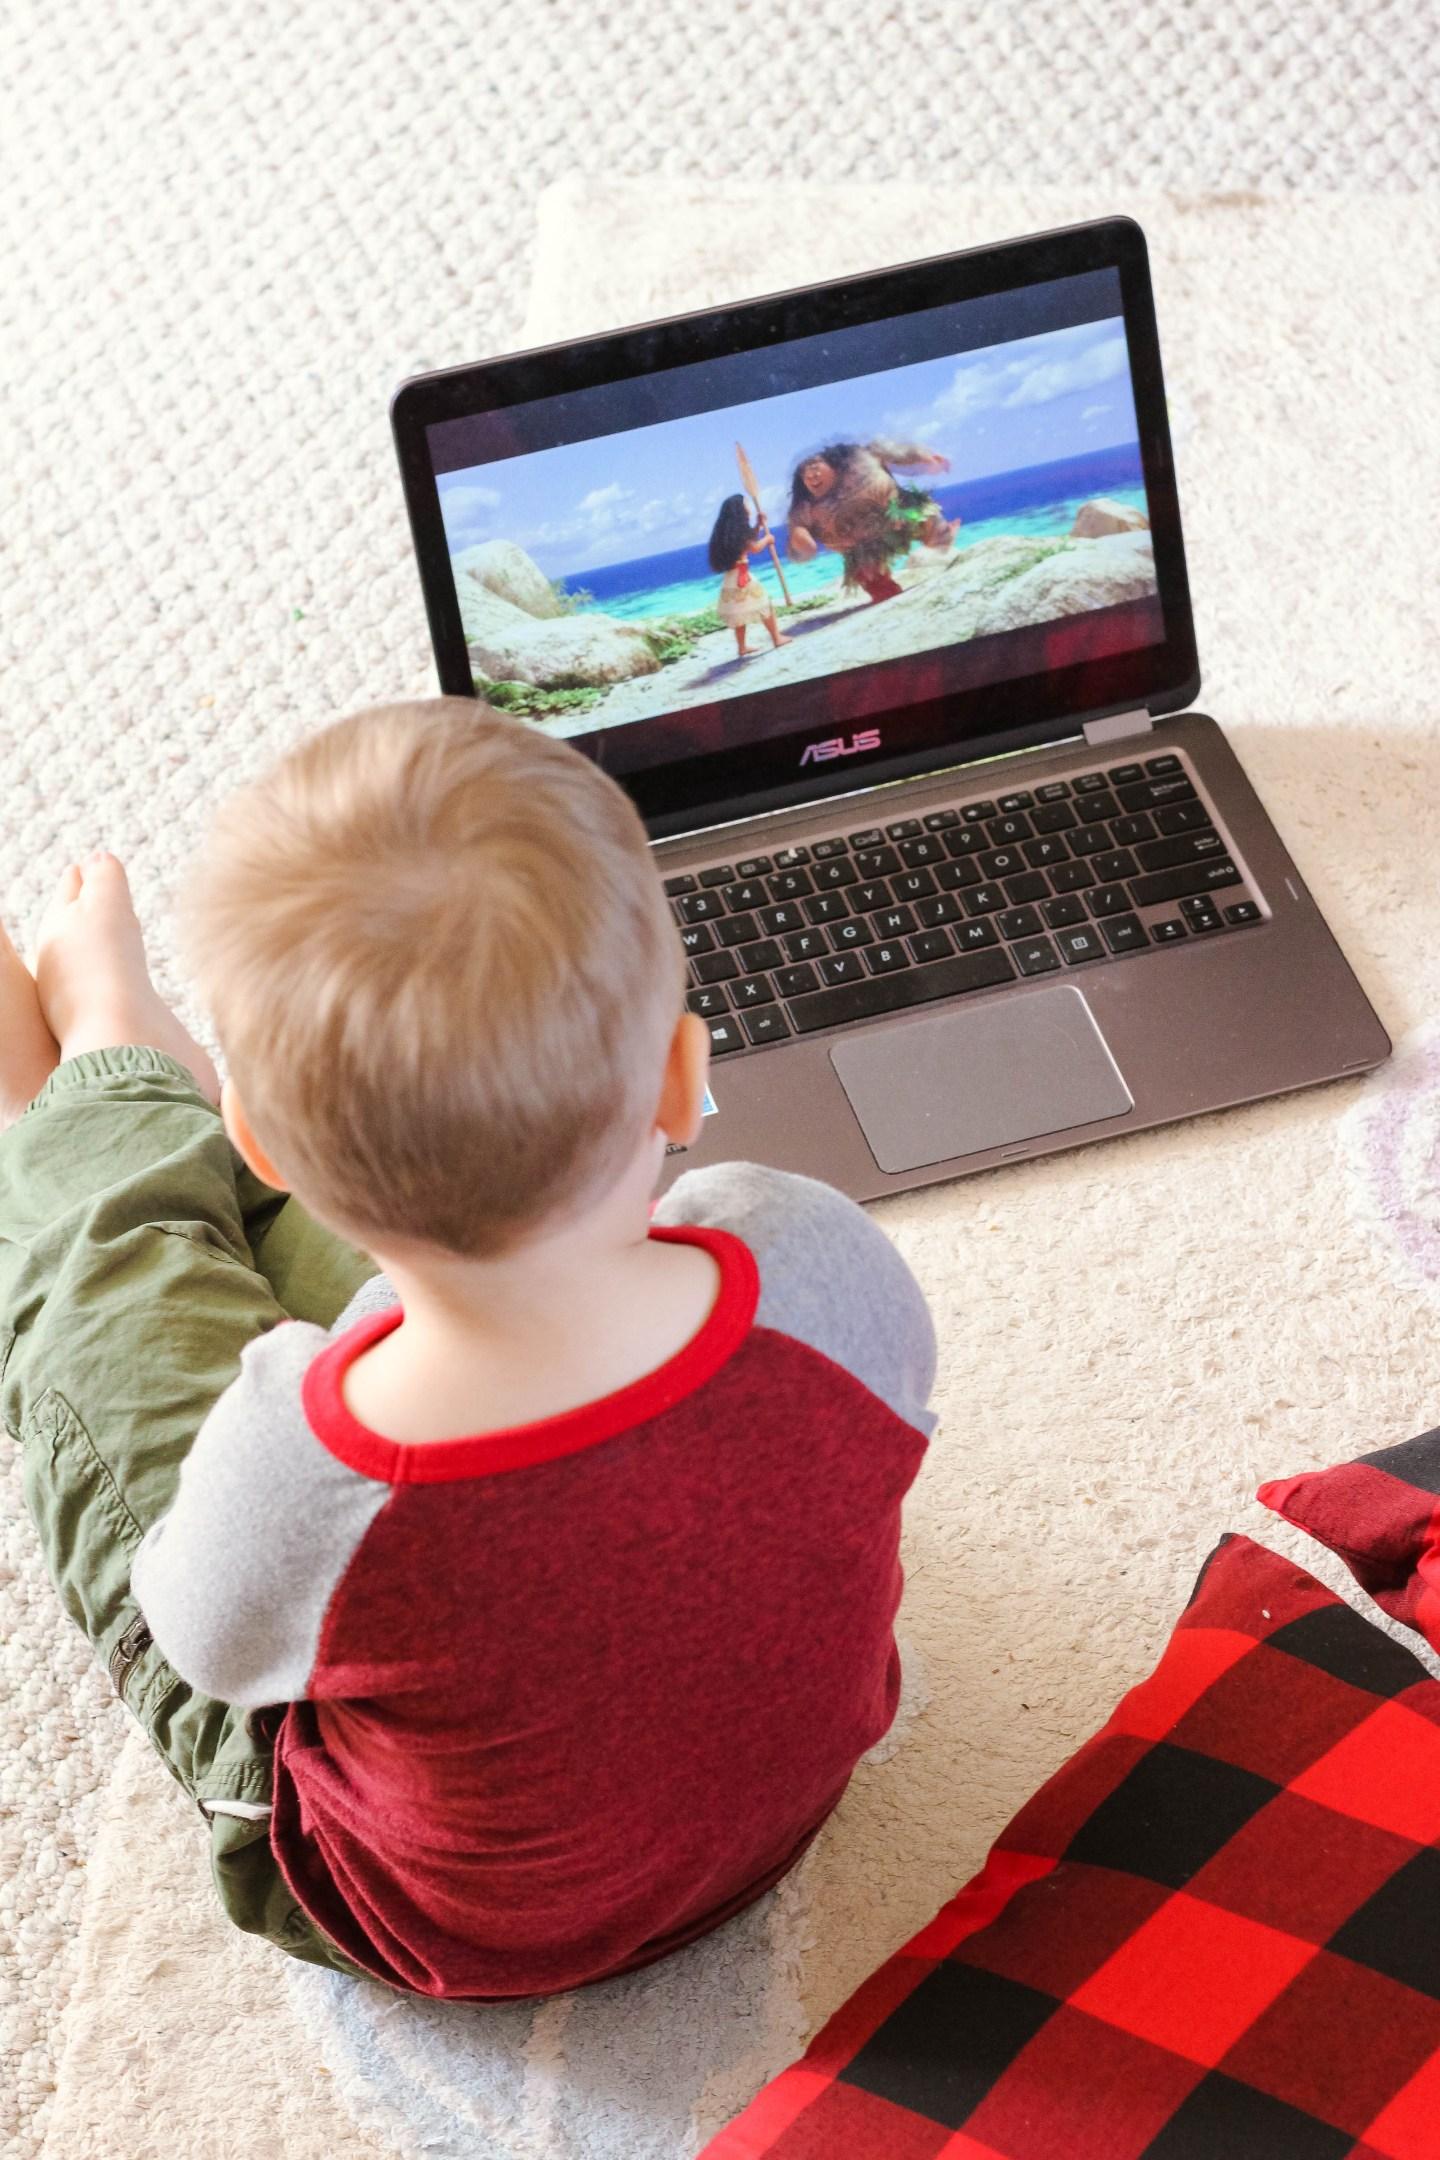 Best Toddler TV Shows_Toddler Watching Moana